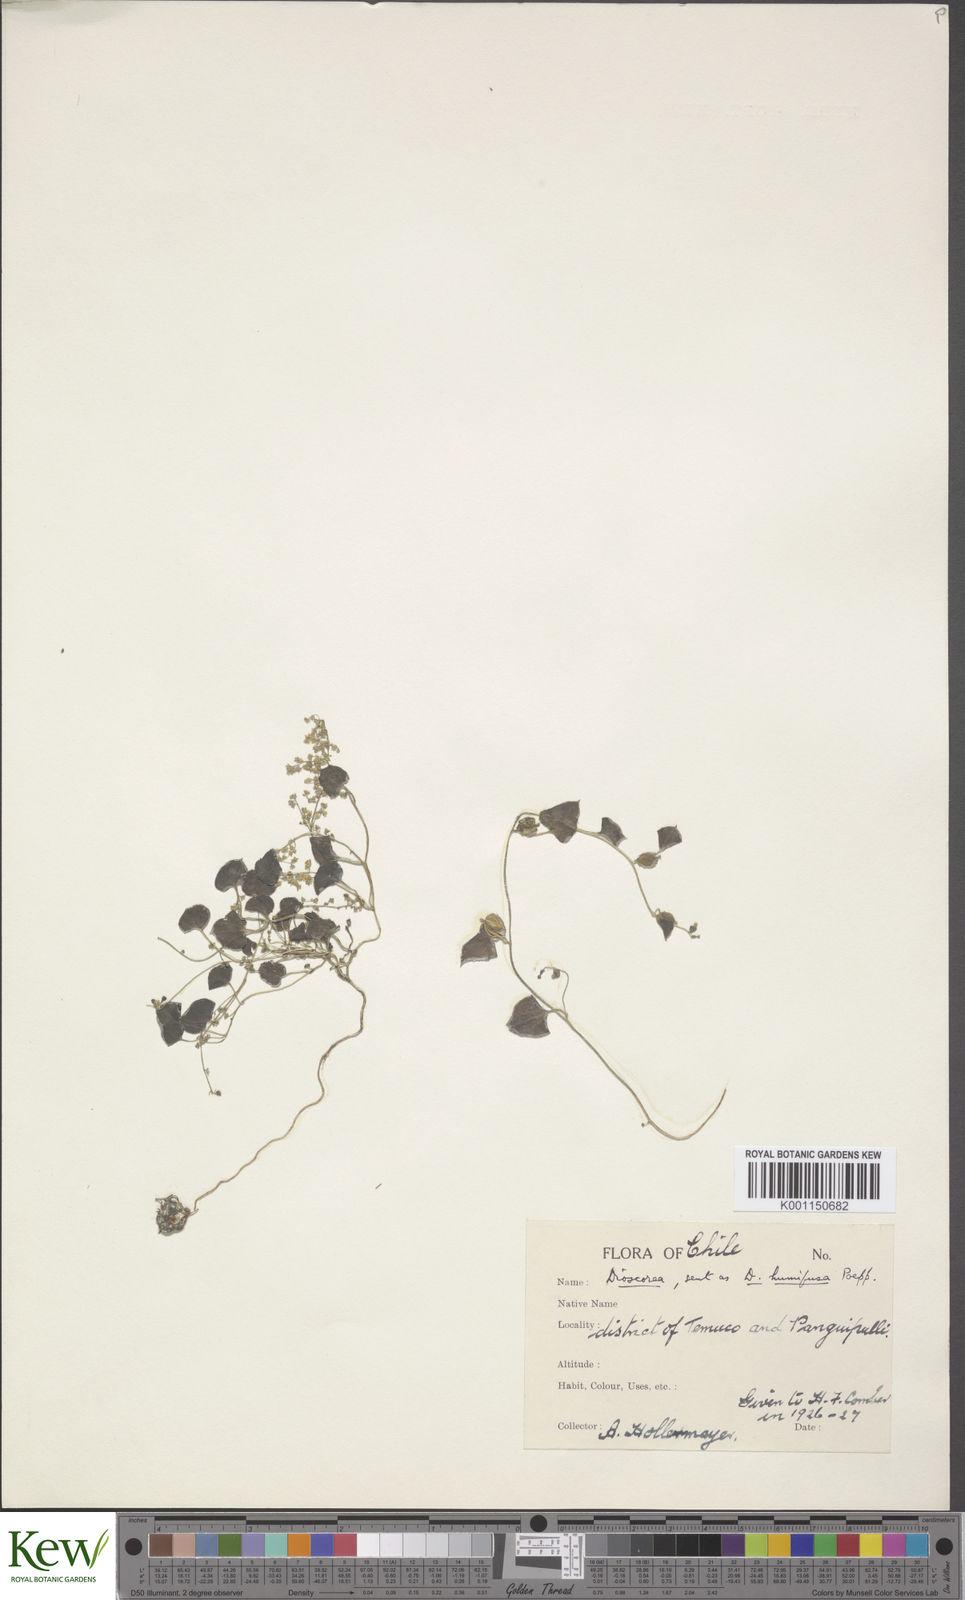 Dioscorea besseriana Kunth | Plants of the World Online | Kew Science